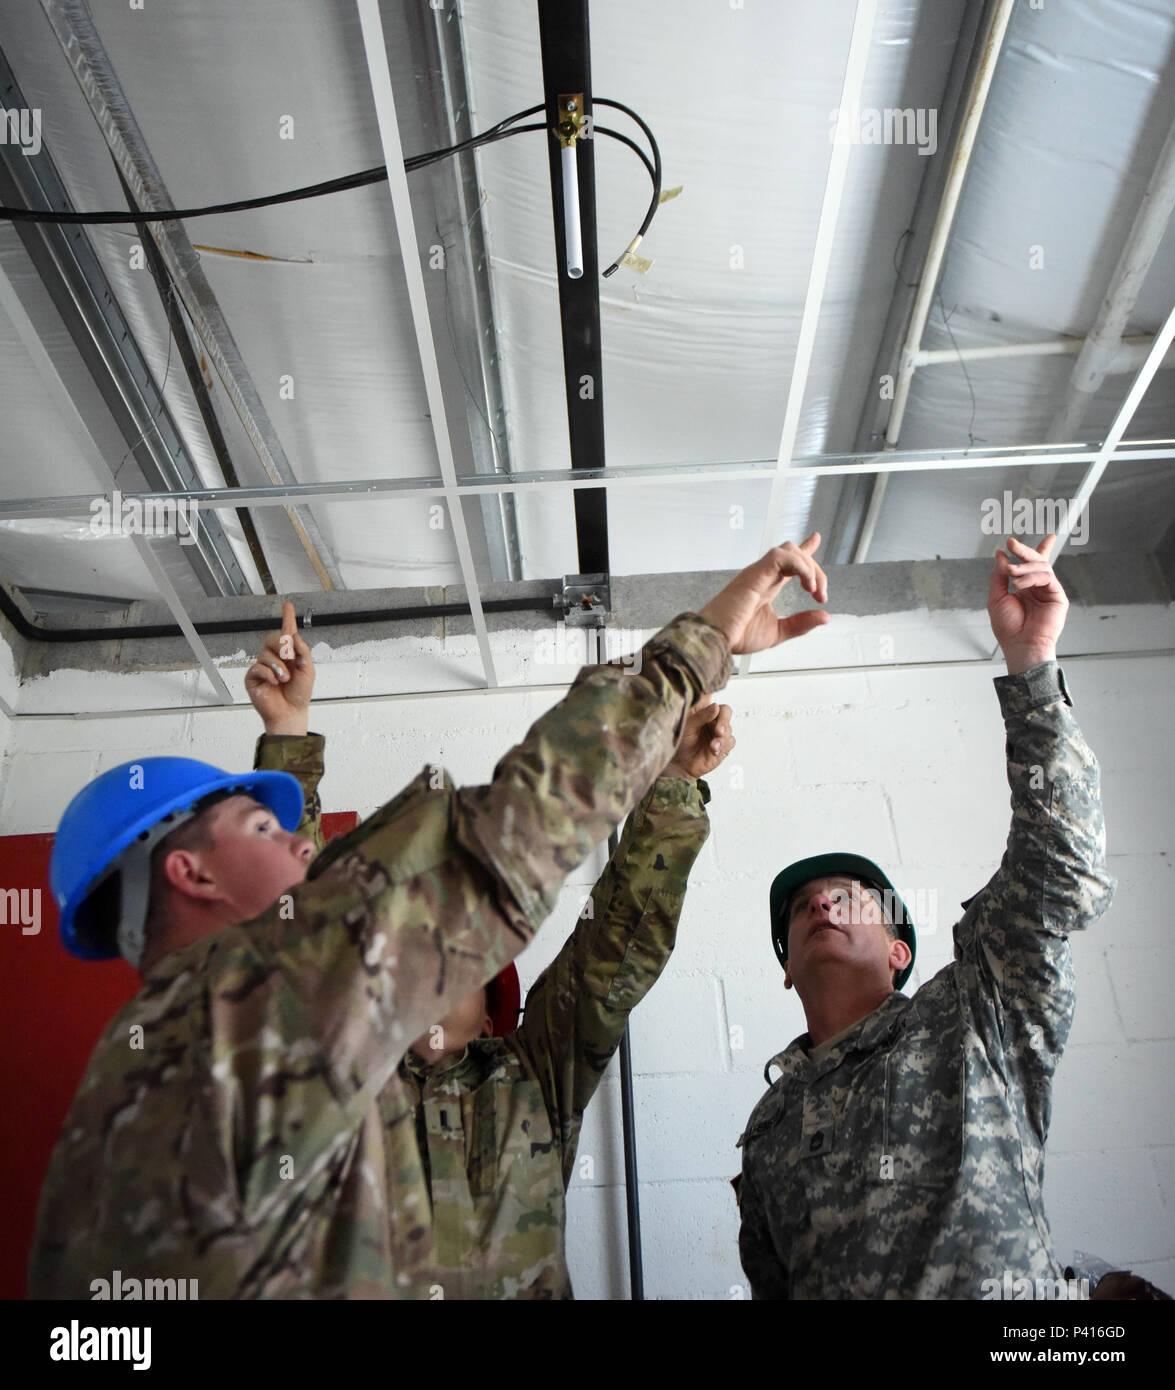 TOCACHE, Guatemala – U.S. Army Sgt. 1st Class Brian Hafenstein ...